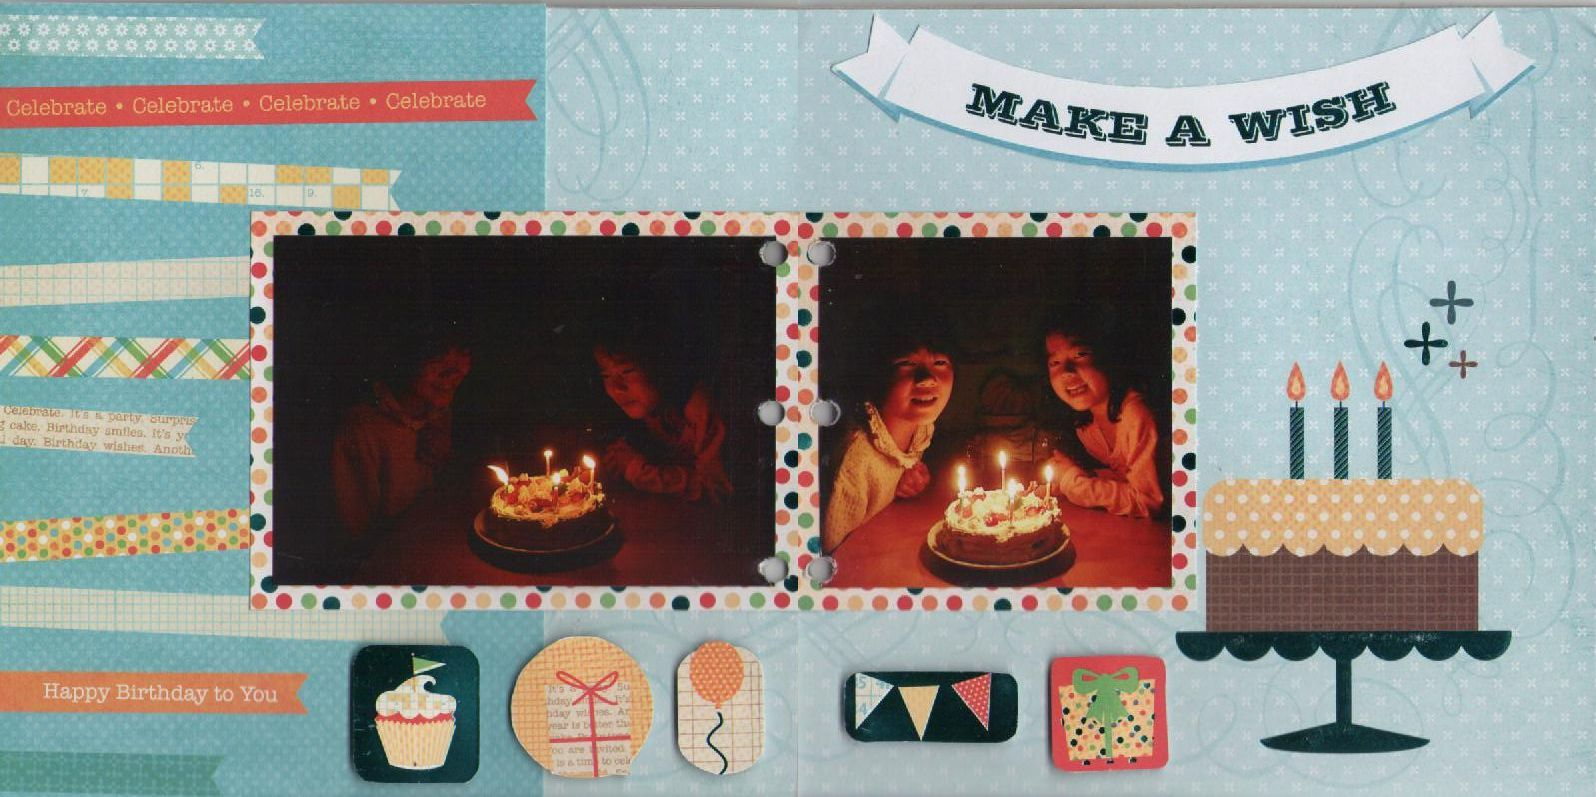 Celebrate6_2